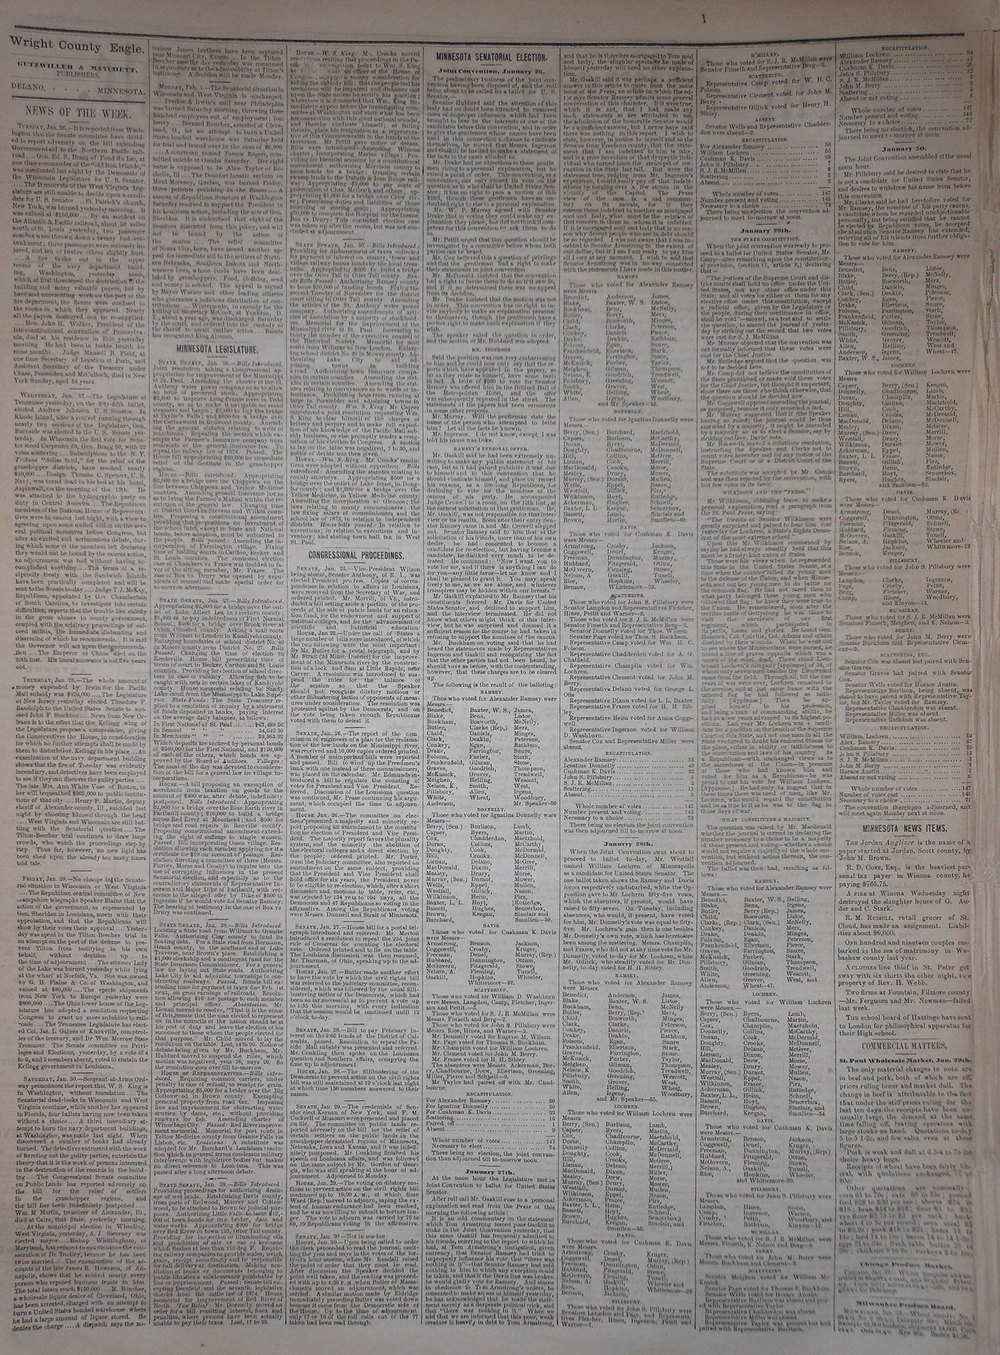 2/3/1875, p2